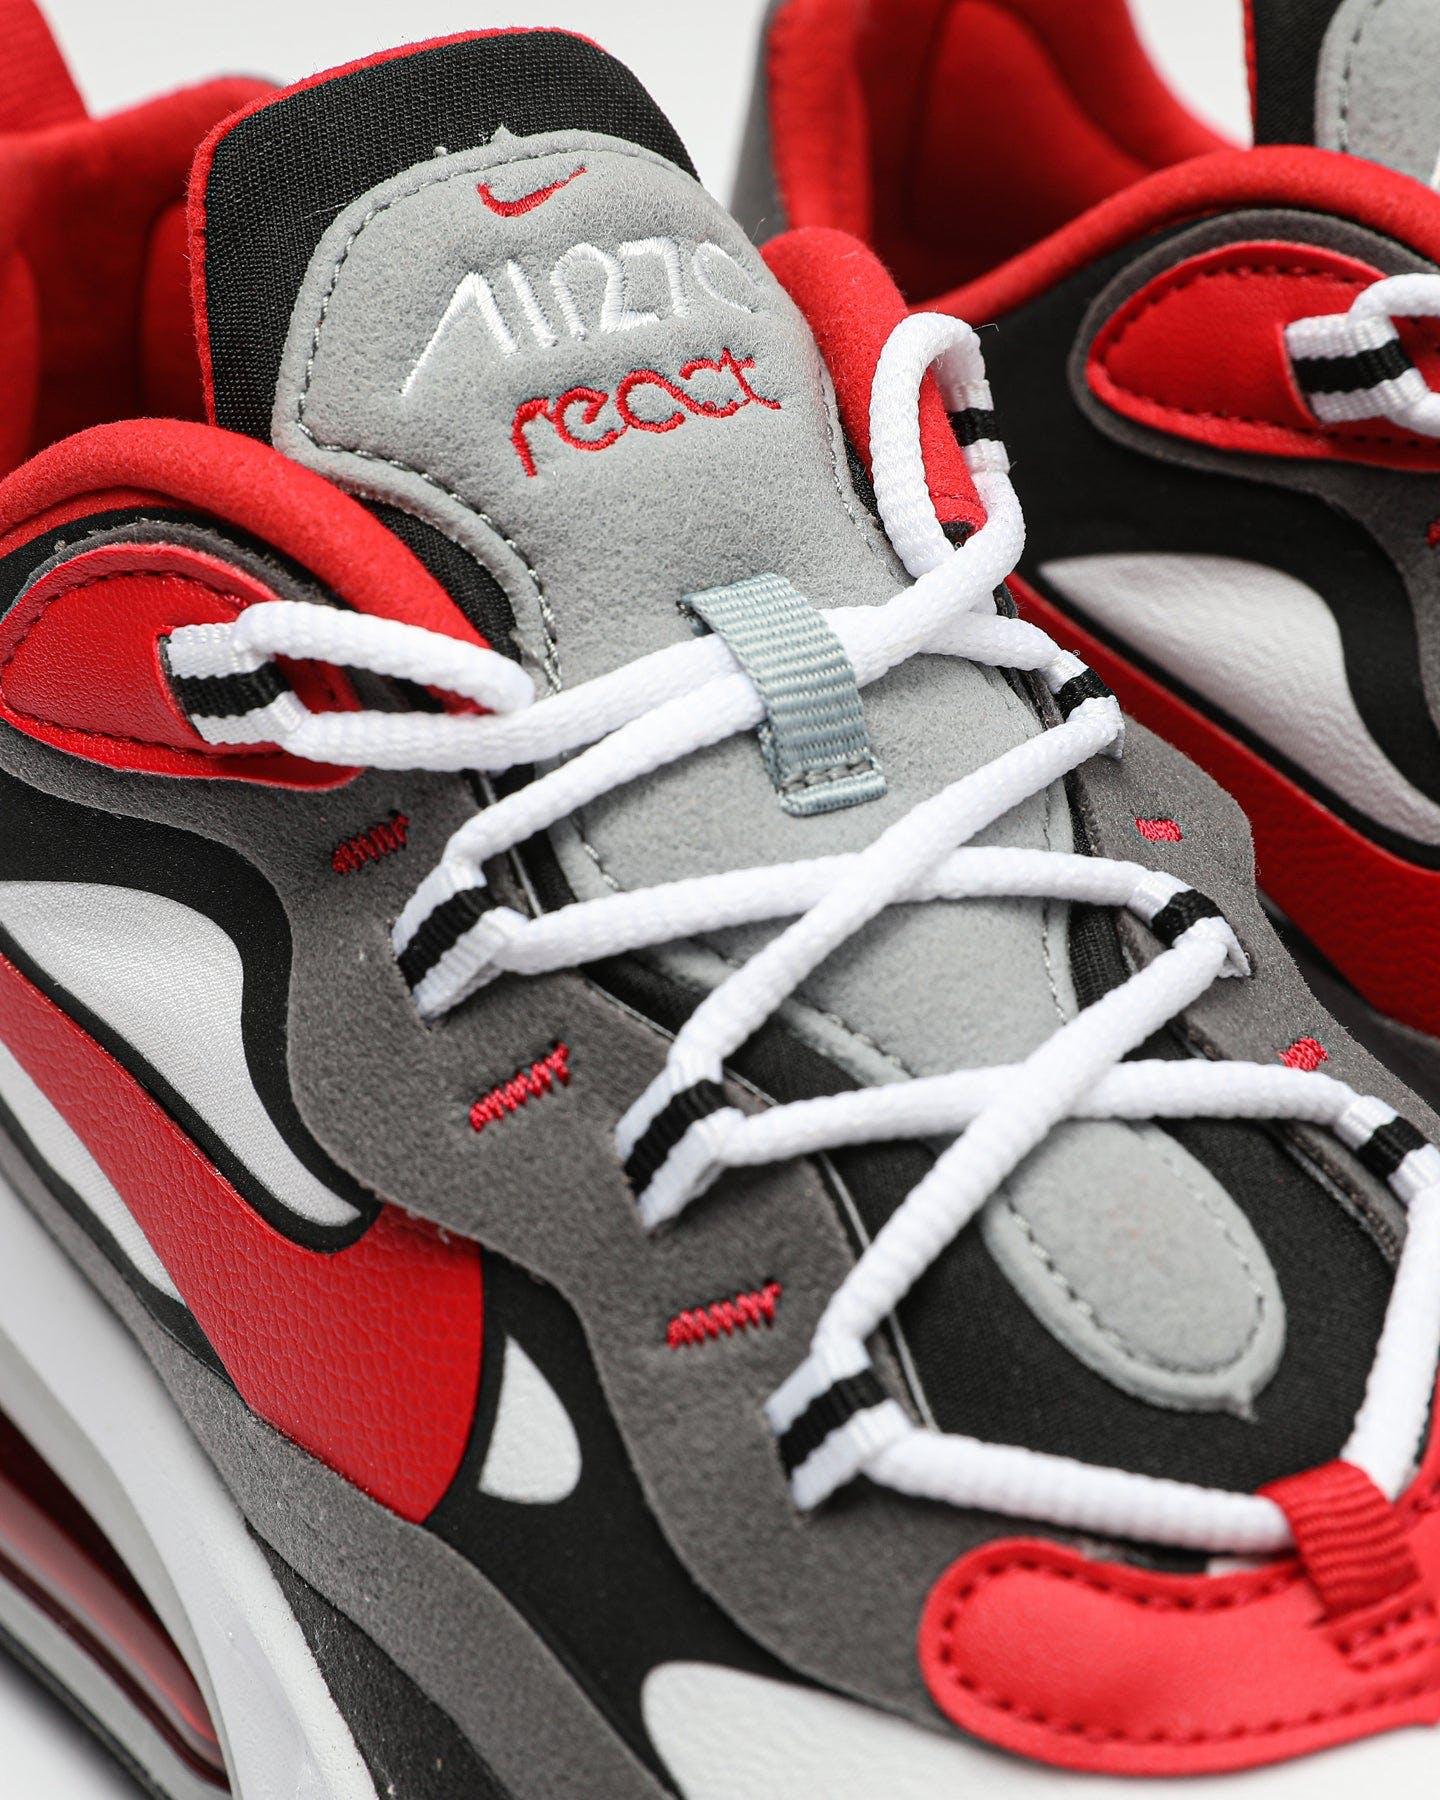 Nike Air Max 270 React Black Red White Culture Kings